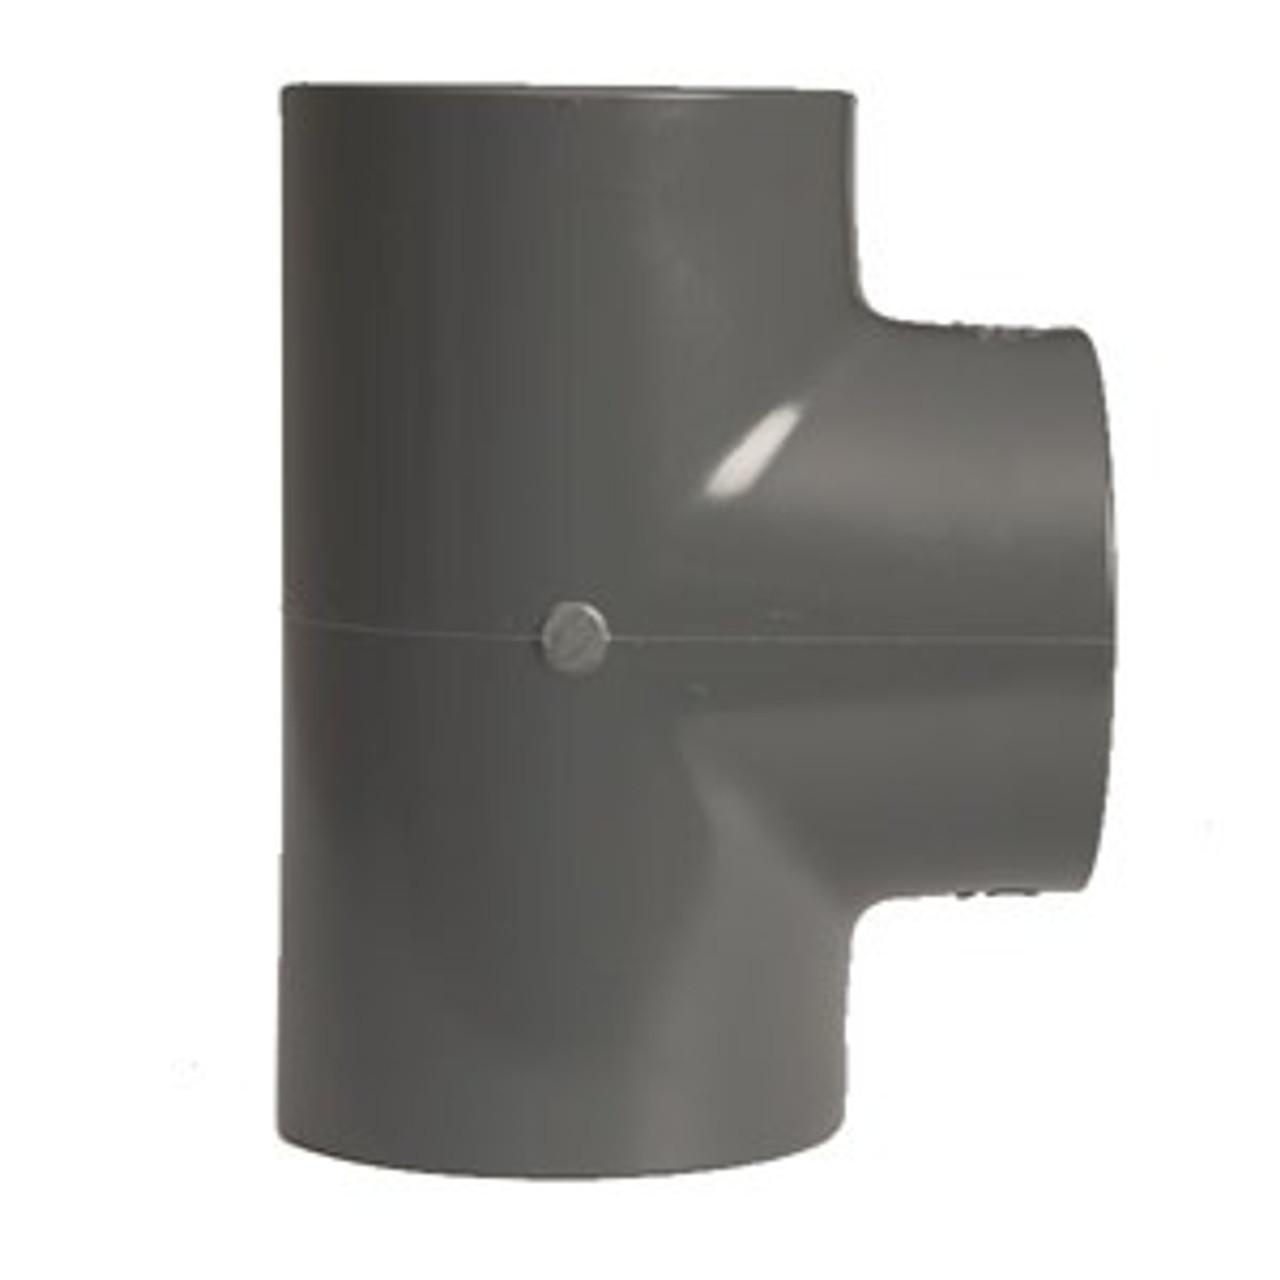 +GF+ | Tee 90 Equal PVC-U 25mm (721200107)